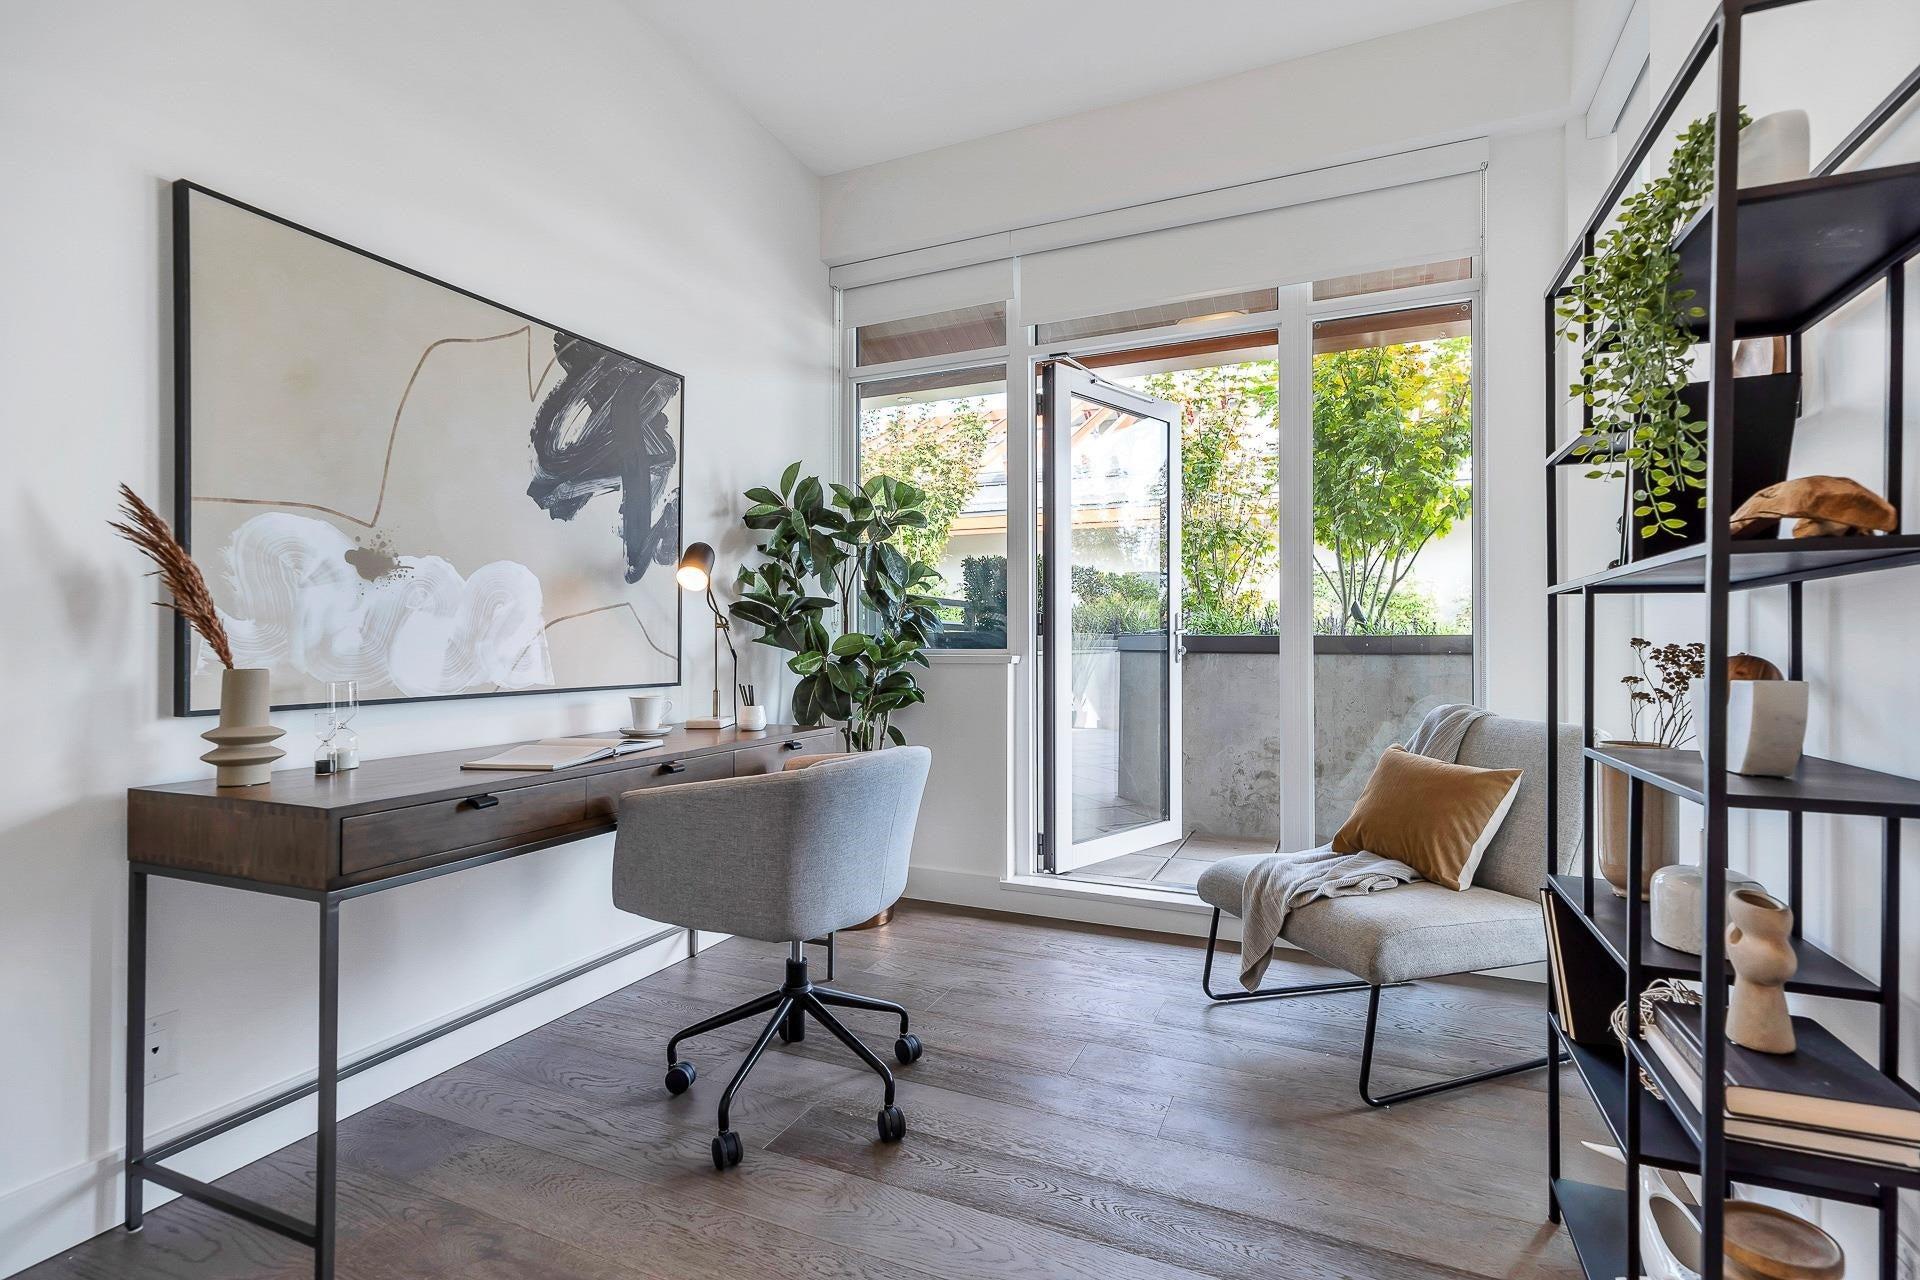 702 2780 VALLEY CENTRE AVENUE - Lynn Valley Apartment/Condo for sale, 3 Bedrooms (R2622279) - #17